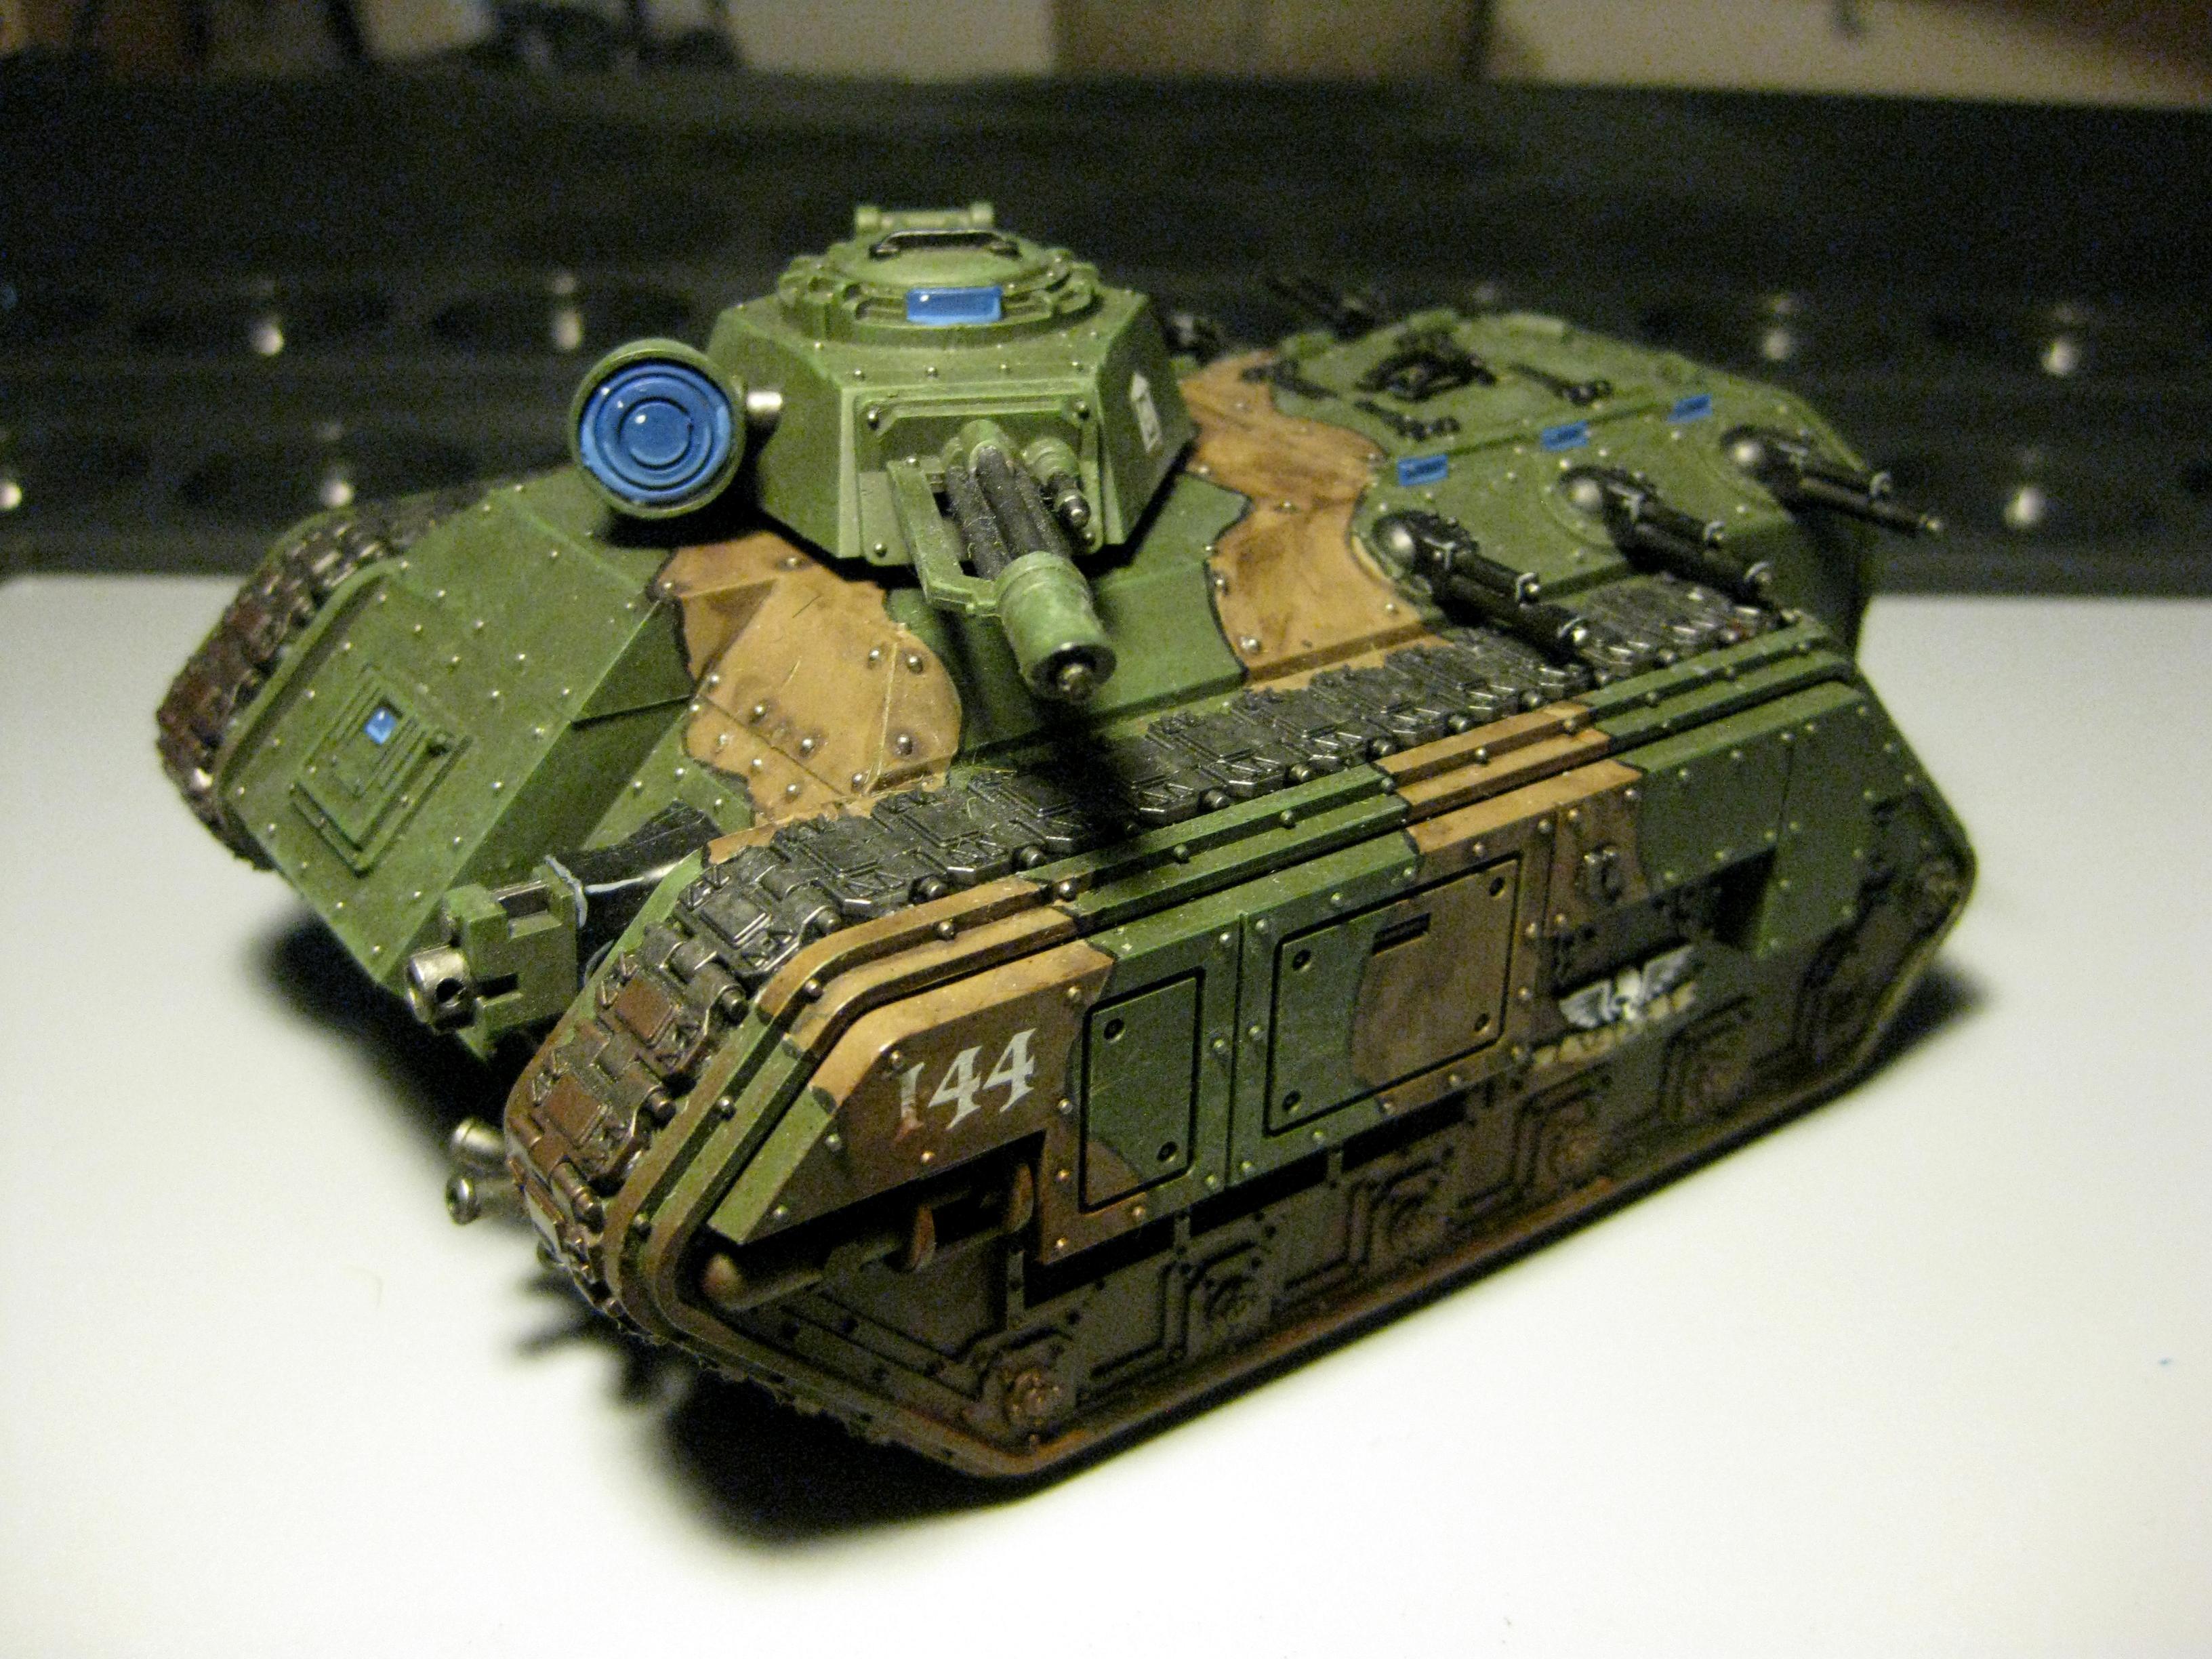 144, 2, Armored Fist, Astra Militarum, Camouflage, Chimera, Imperial Guard, Lycaeus Wrex, Pis, Transport, Warhammer 40,000, Wrex